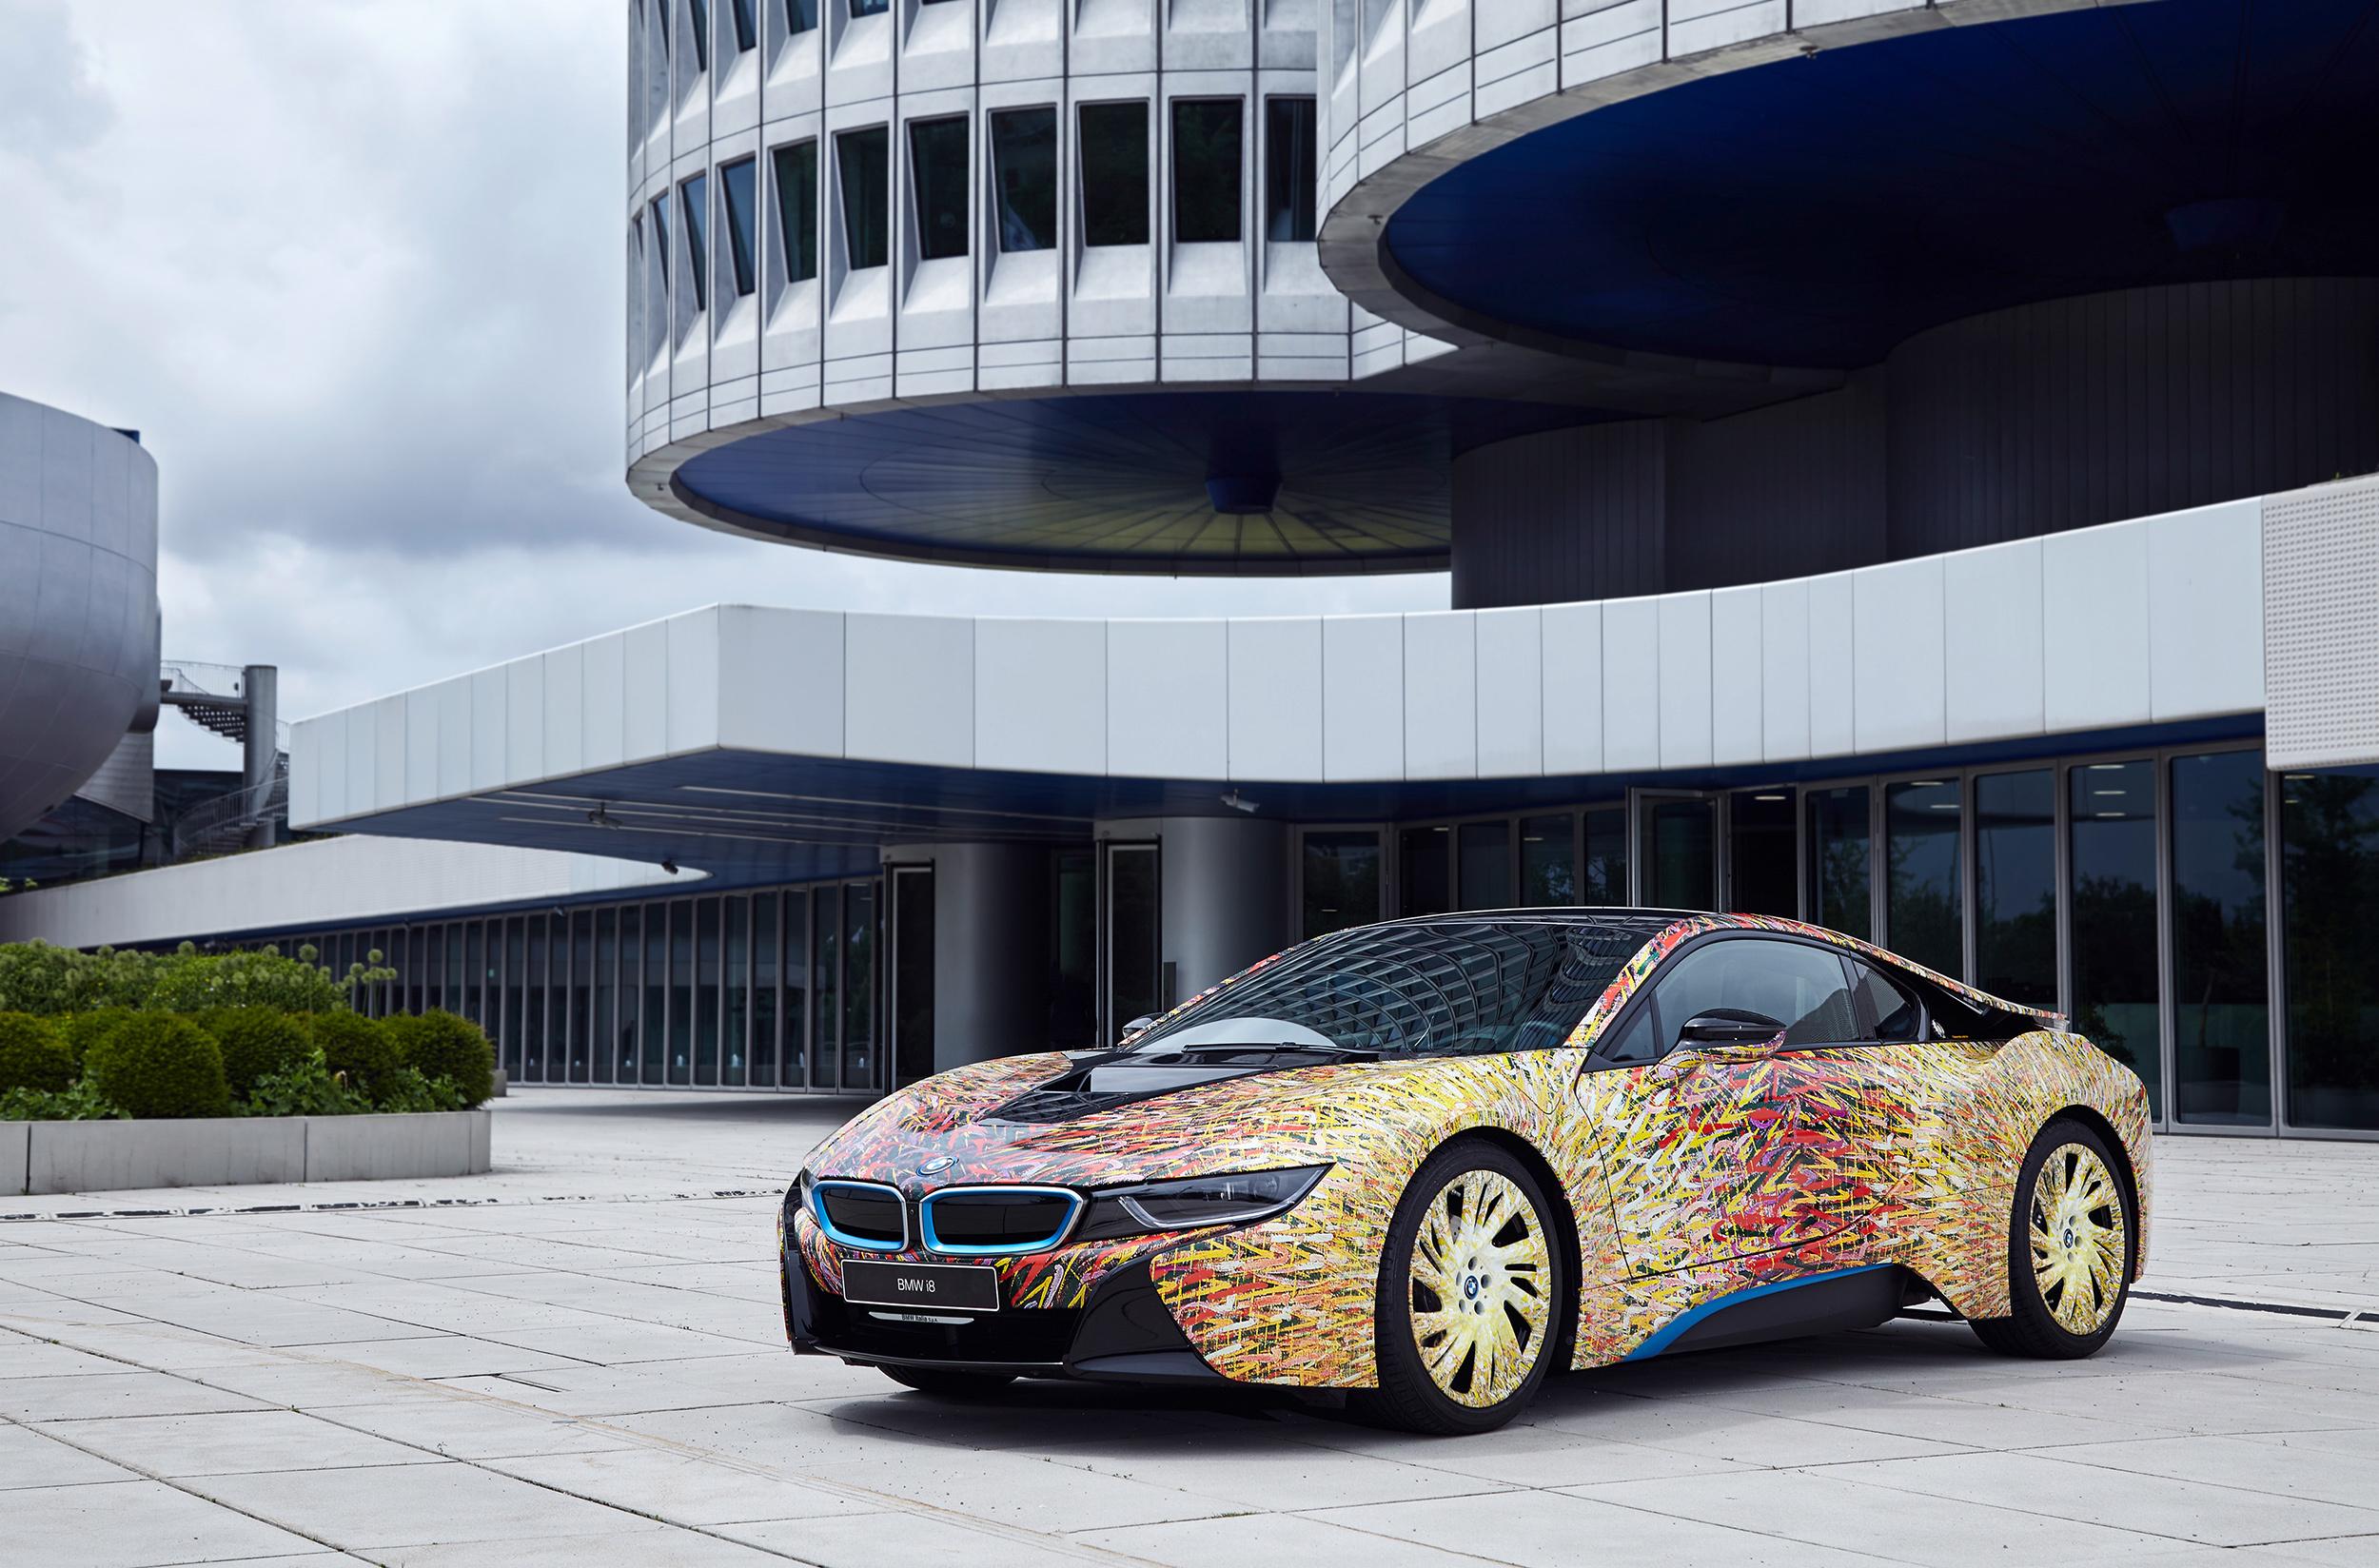 Концепт BMW i8 Futurism Edition скрасил юбилей марки в ...